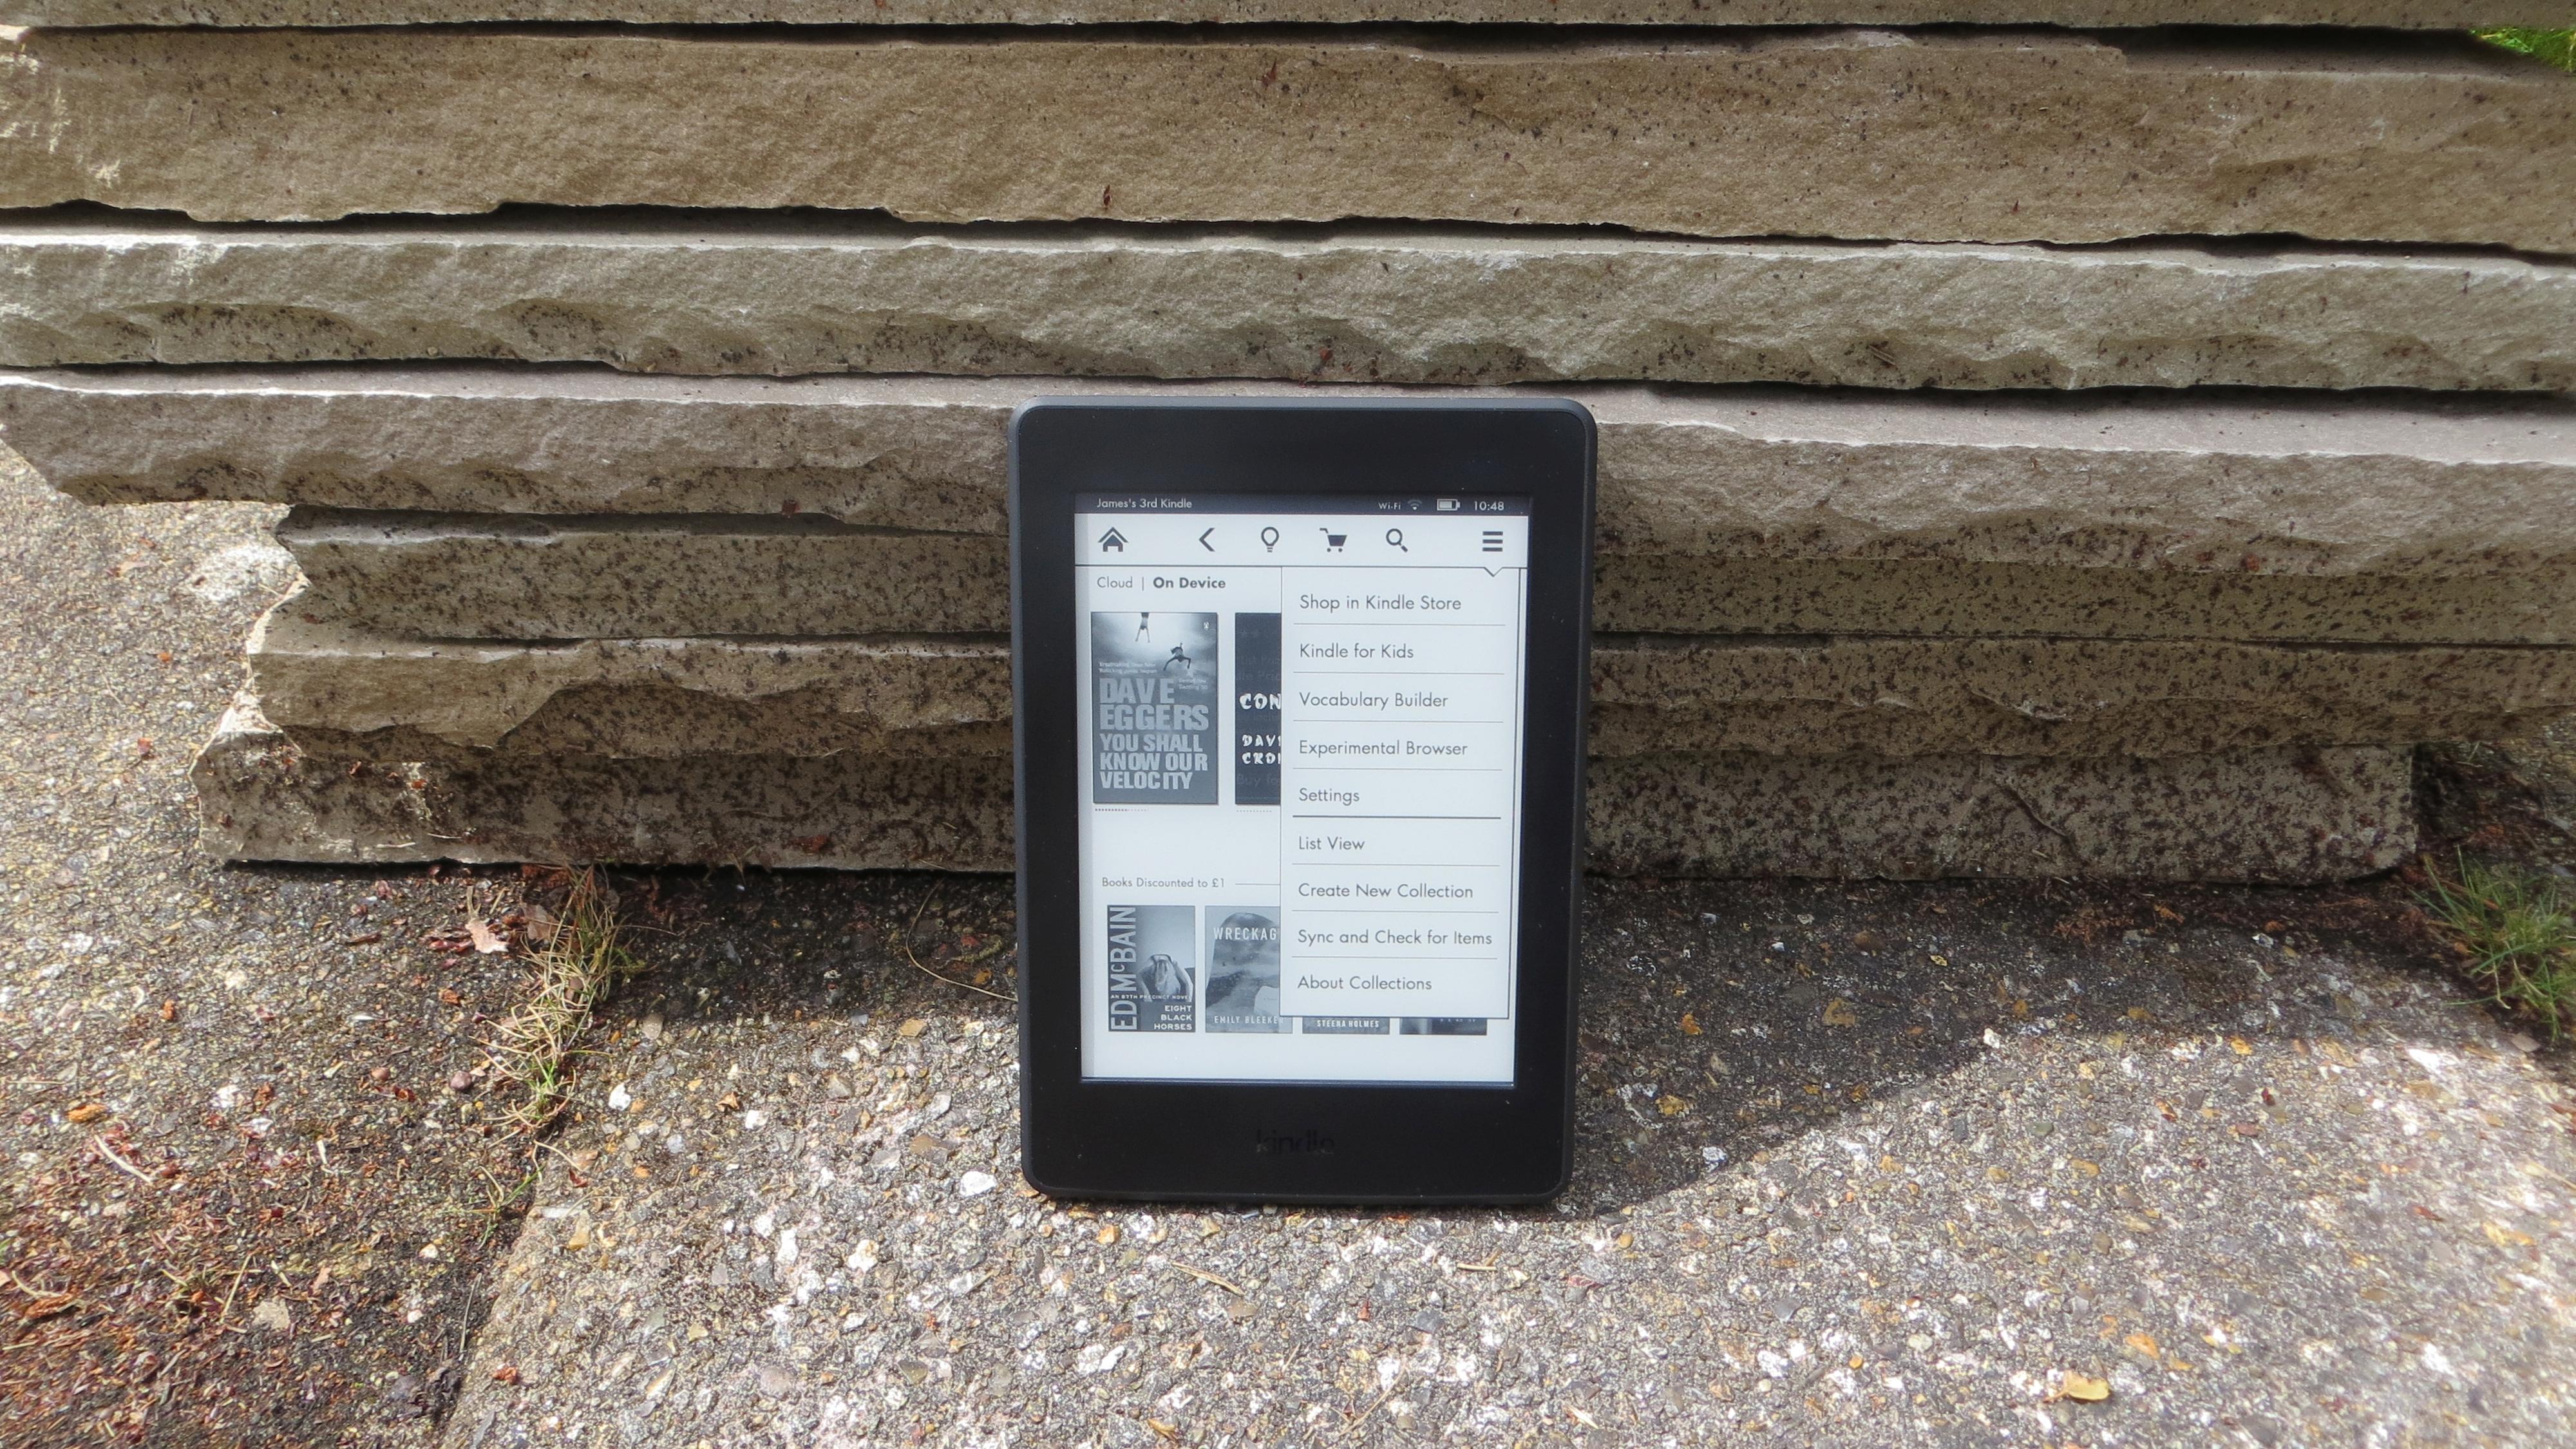 Kindle Vs Sony Reader: The Best Ebook Readers For Australians